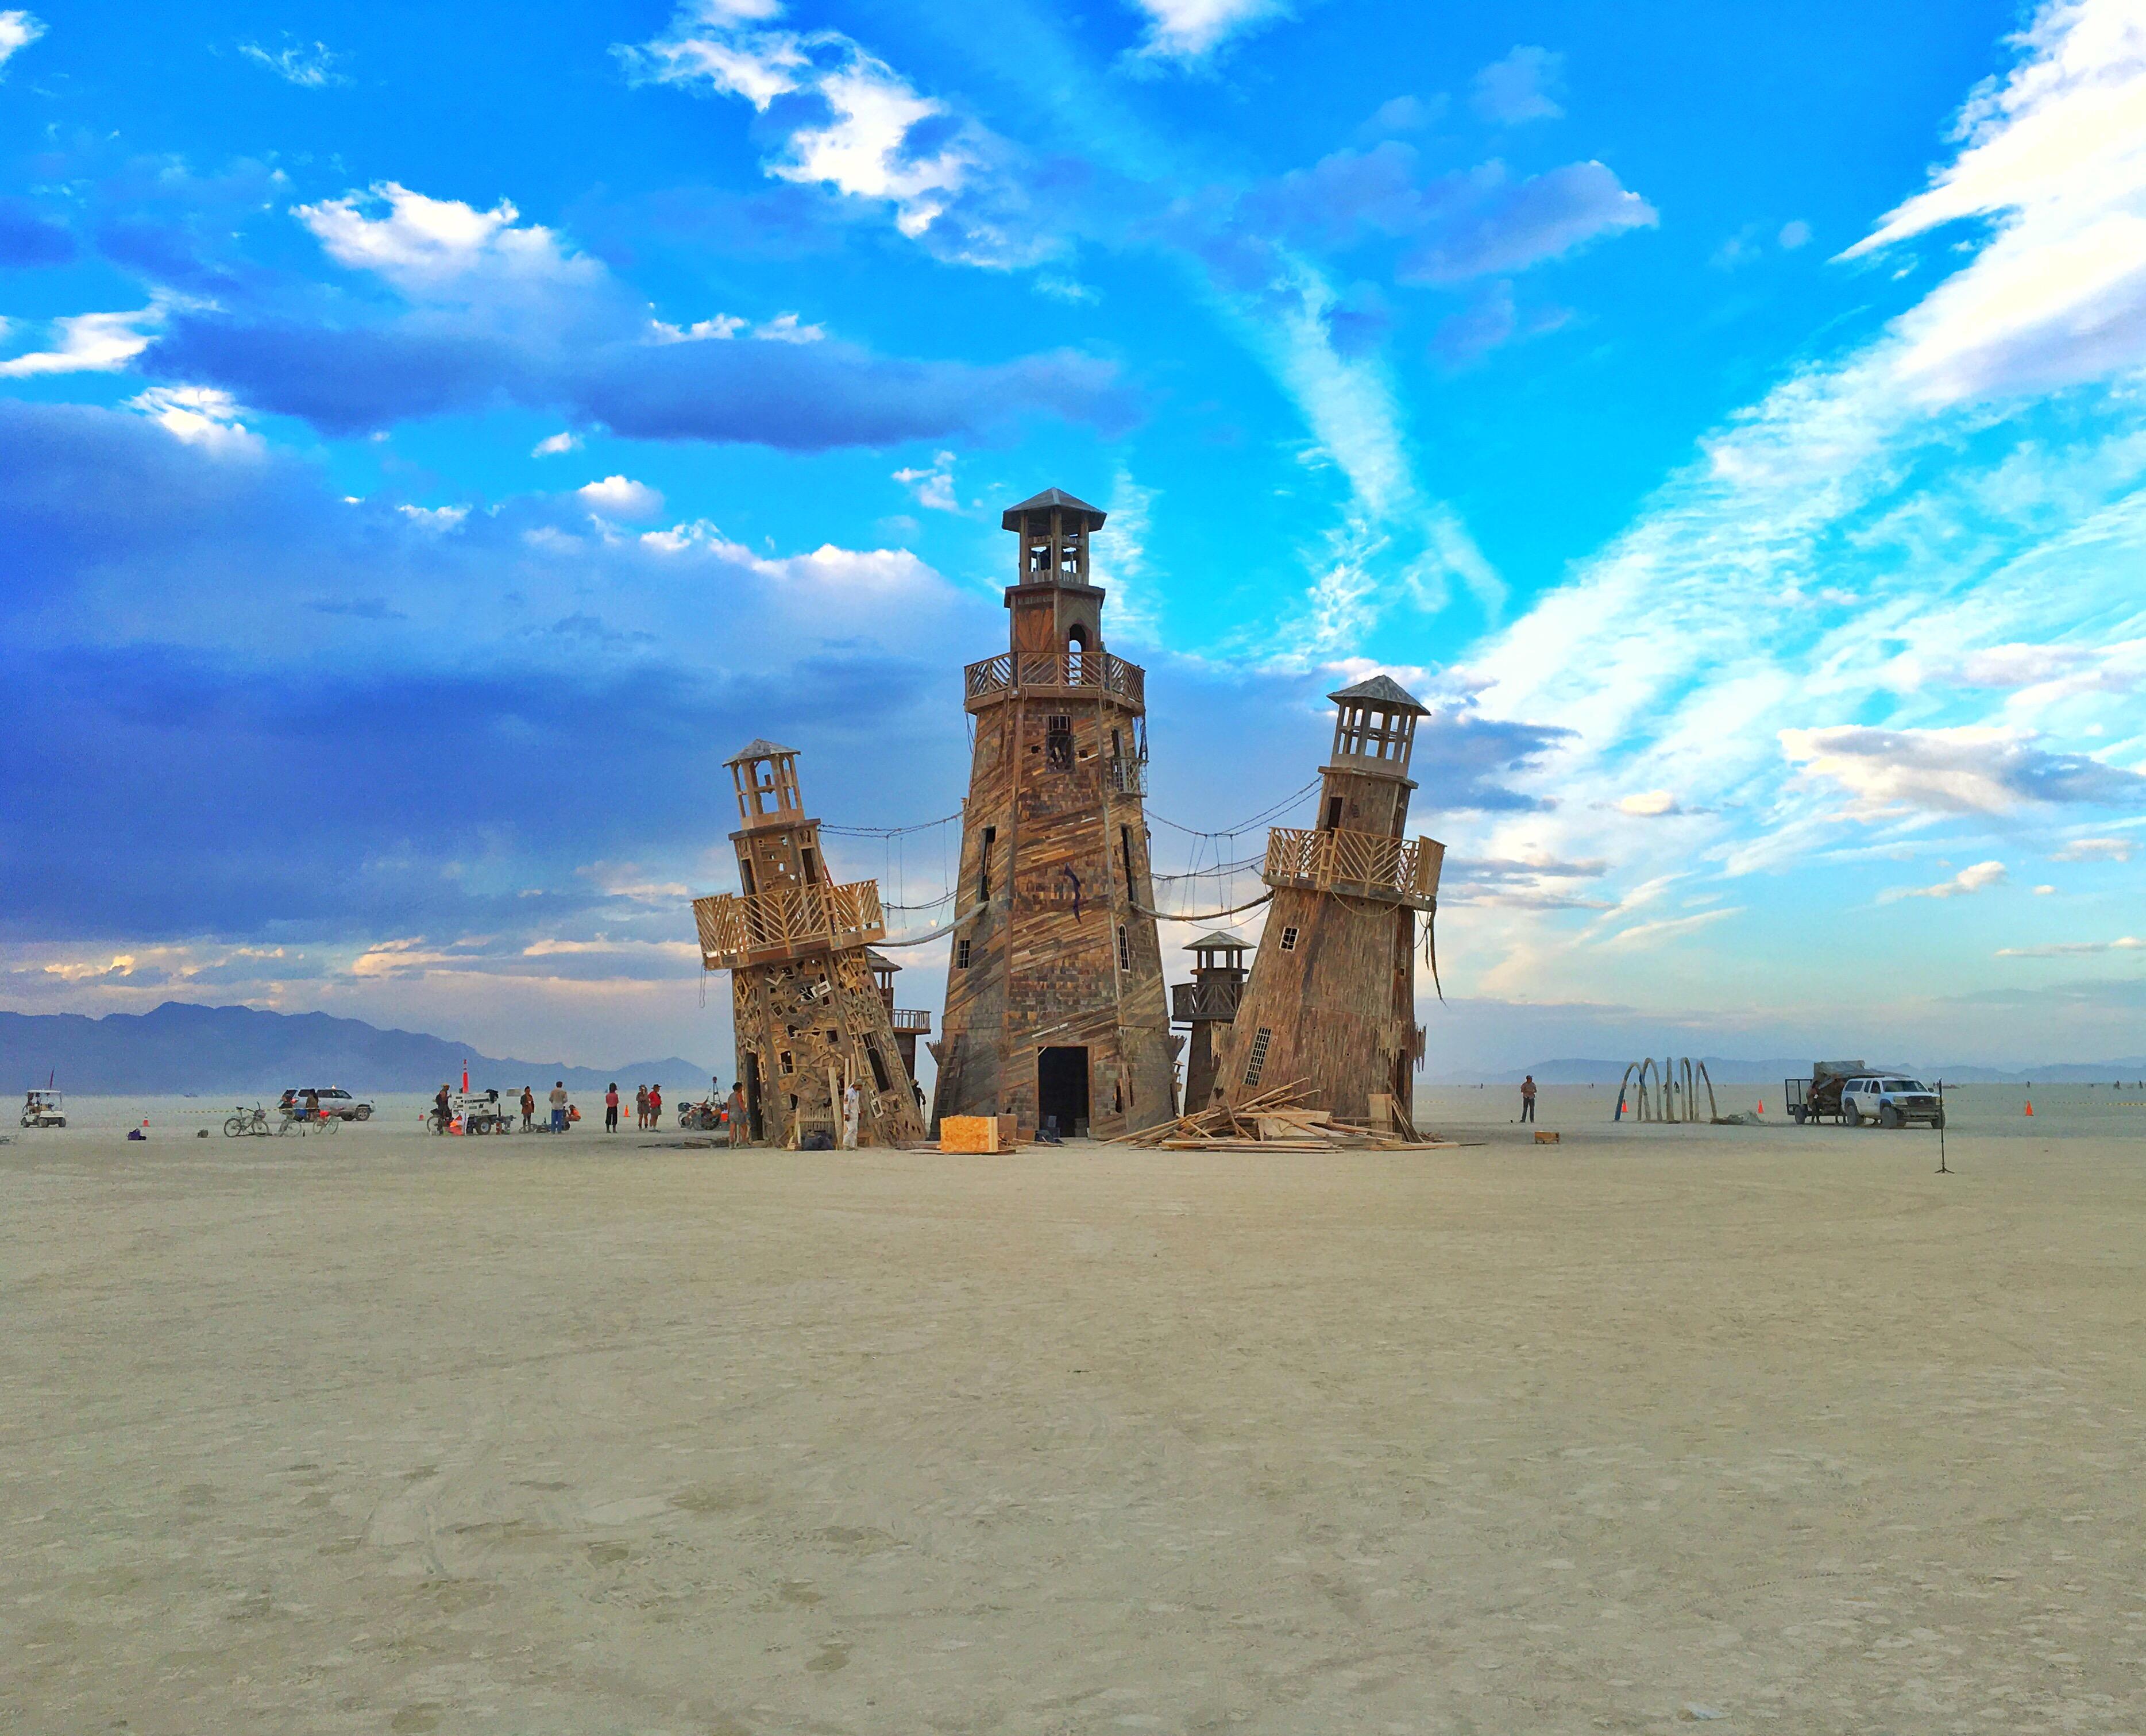 Burning Man Lighthouse Art, 2016